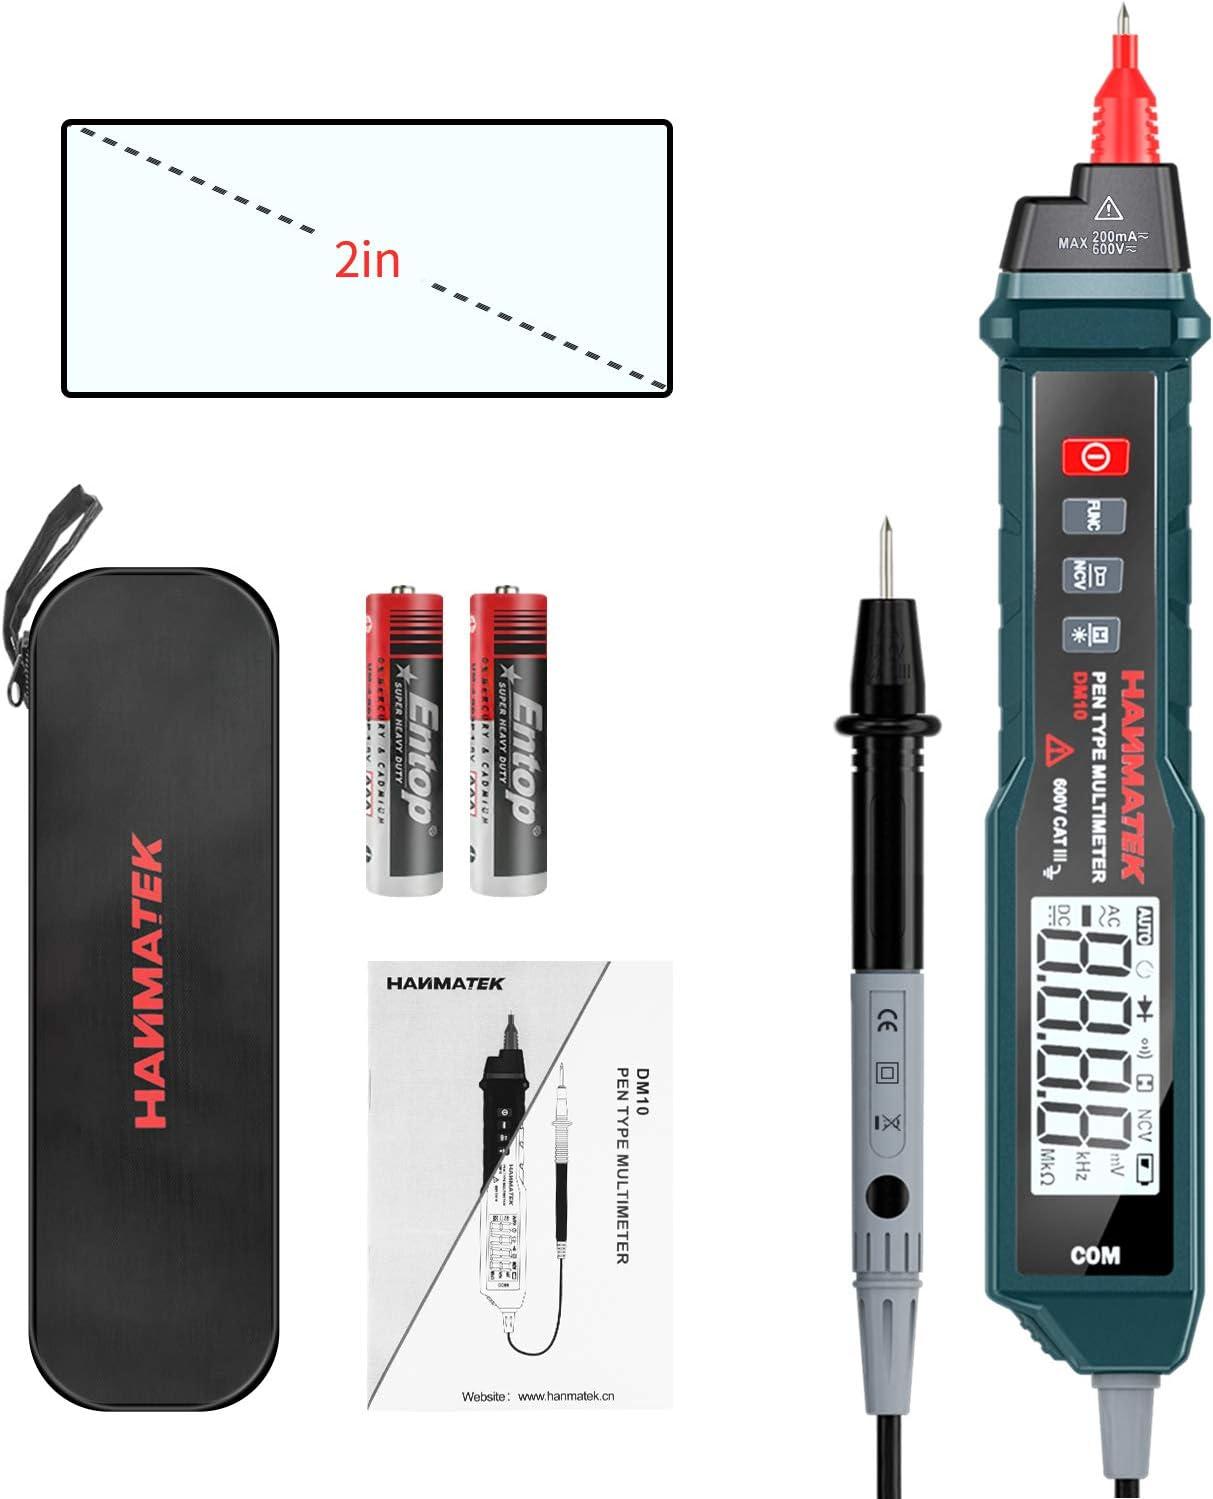 Digital Multimeter Hanmatek Dm10 Digitaler Spannungsprüfer Auto Range True Rms Ac Dc Volt Advanced Current Detector Multimeter Mit Hintergrundbeleuchtung Baumarkt